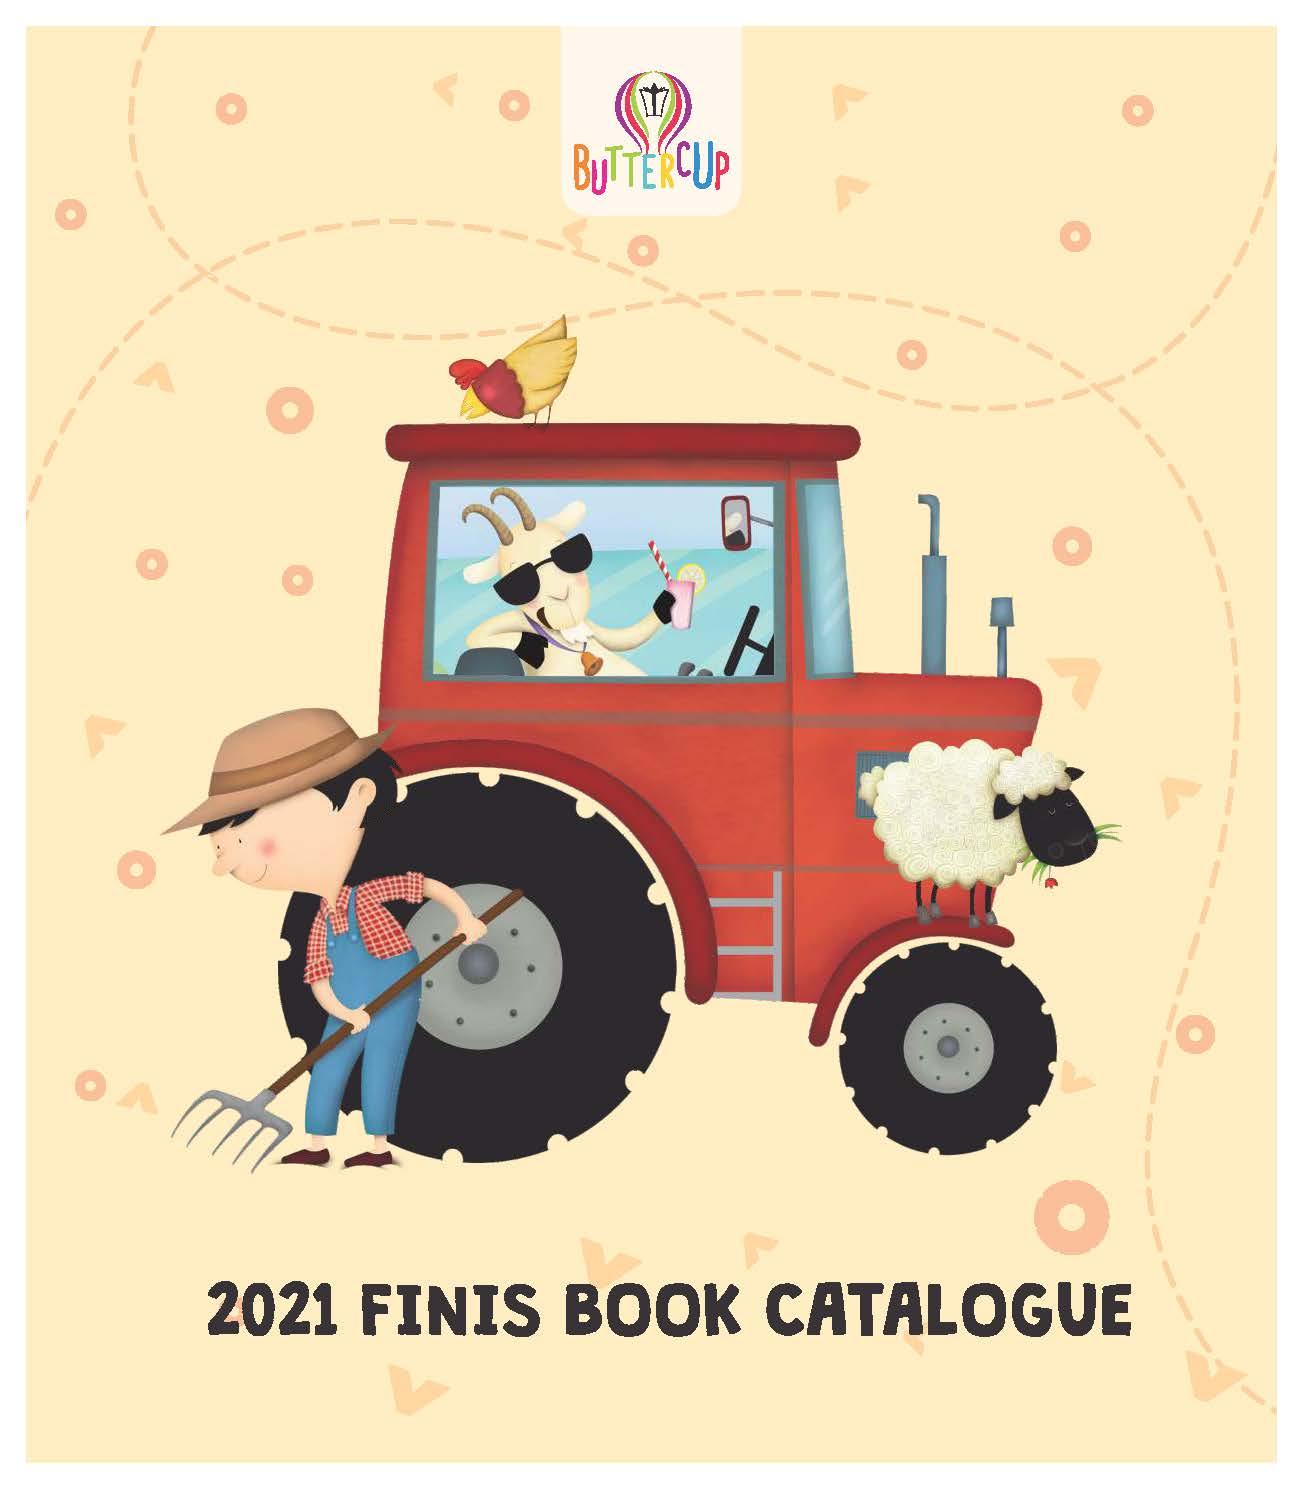 2021 Buttercup Finish Book Catalogue